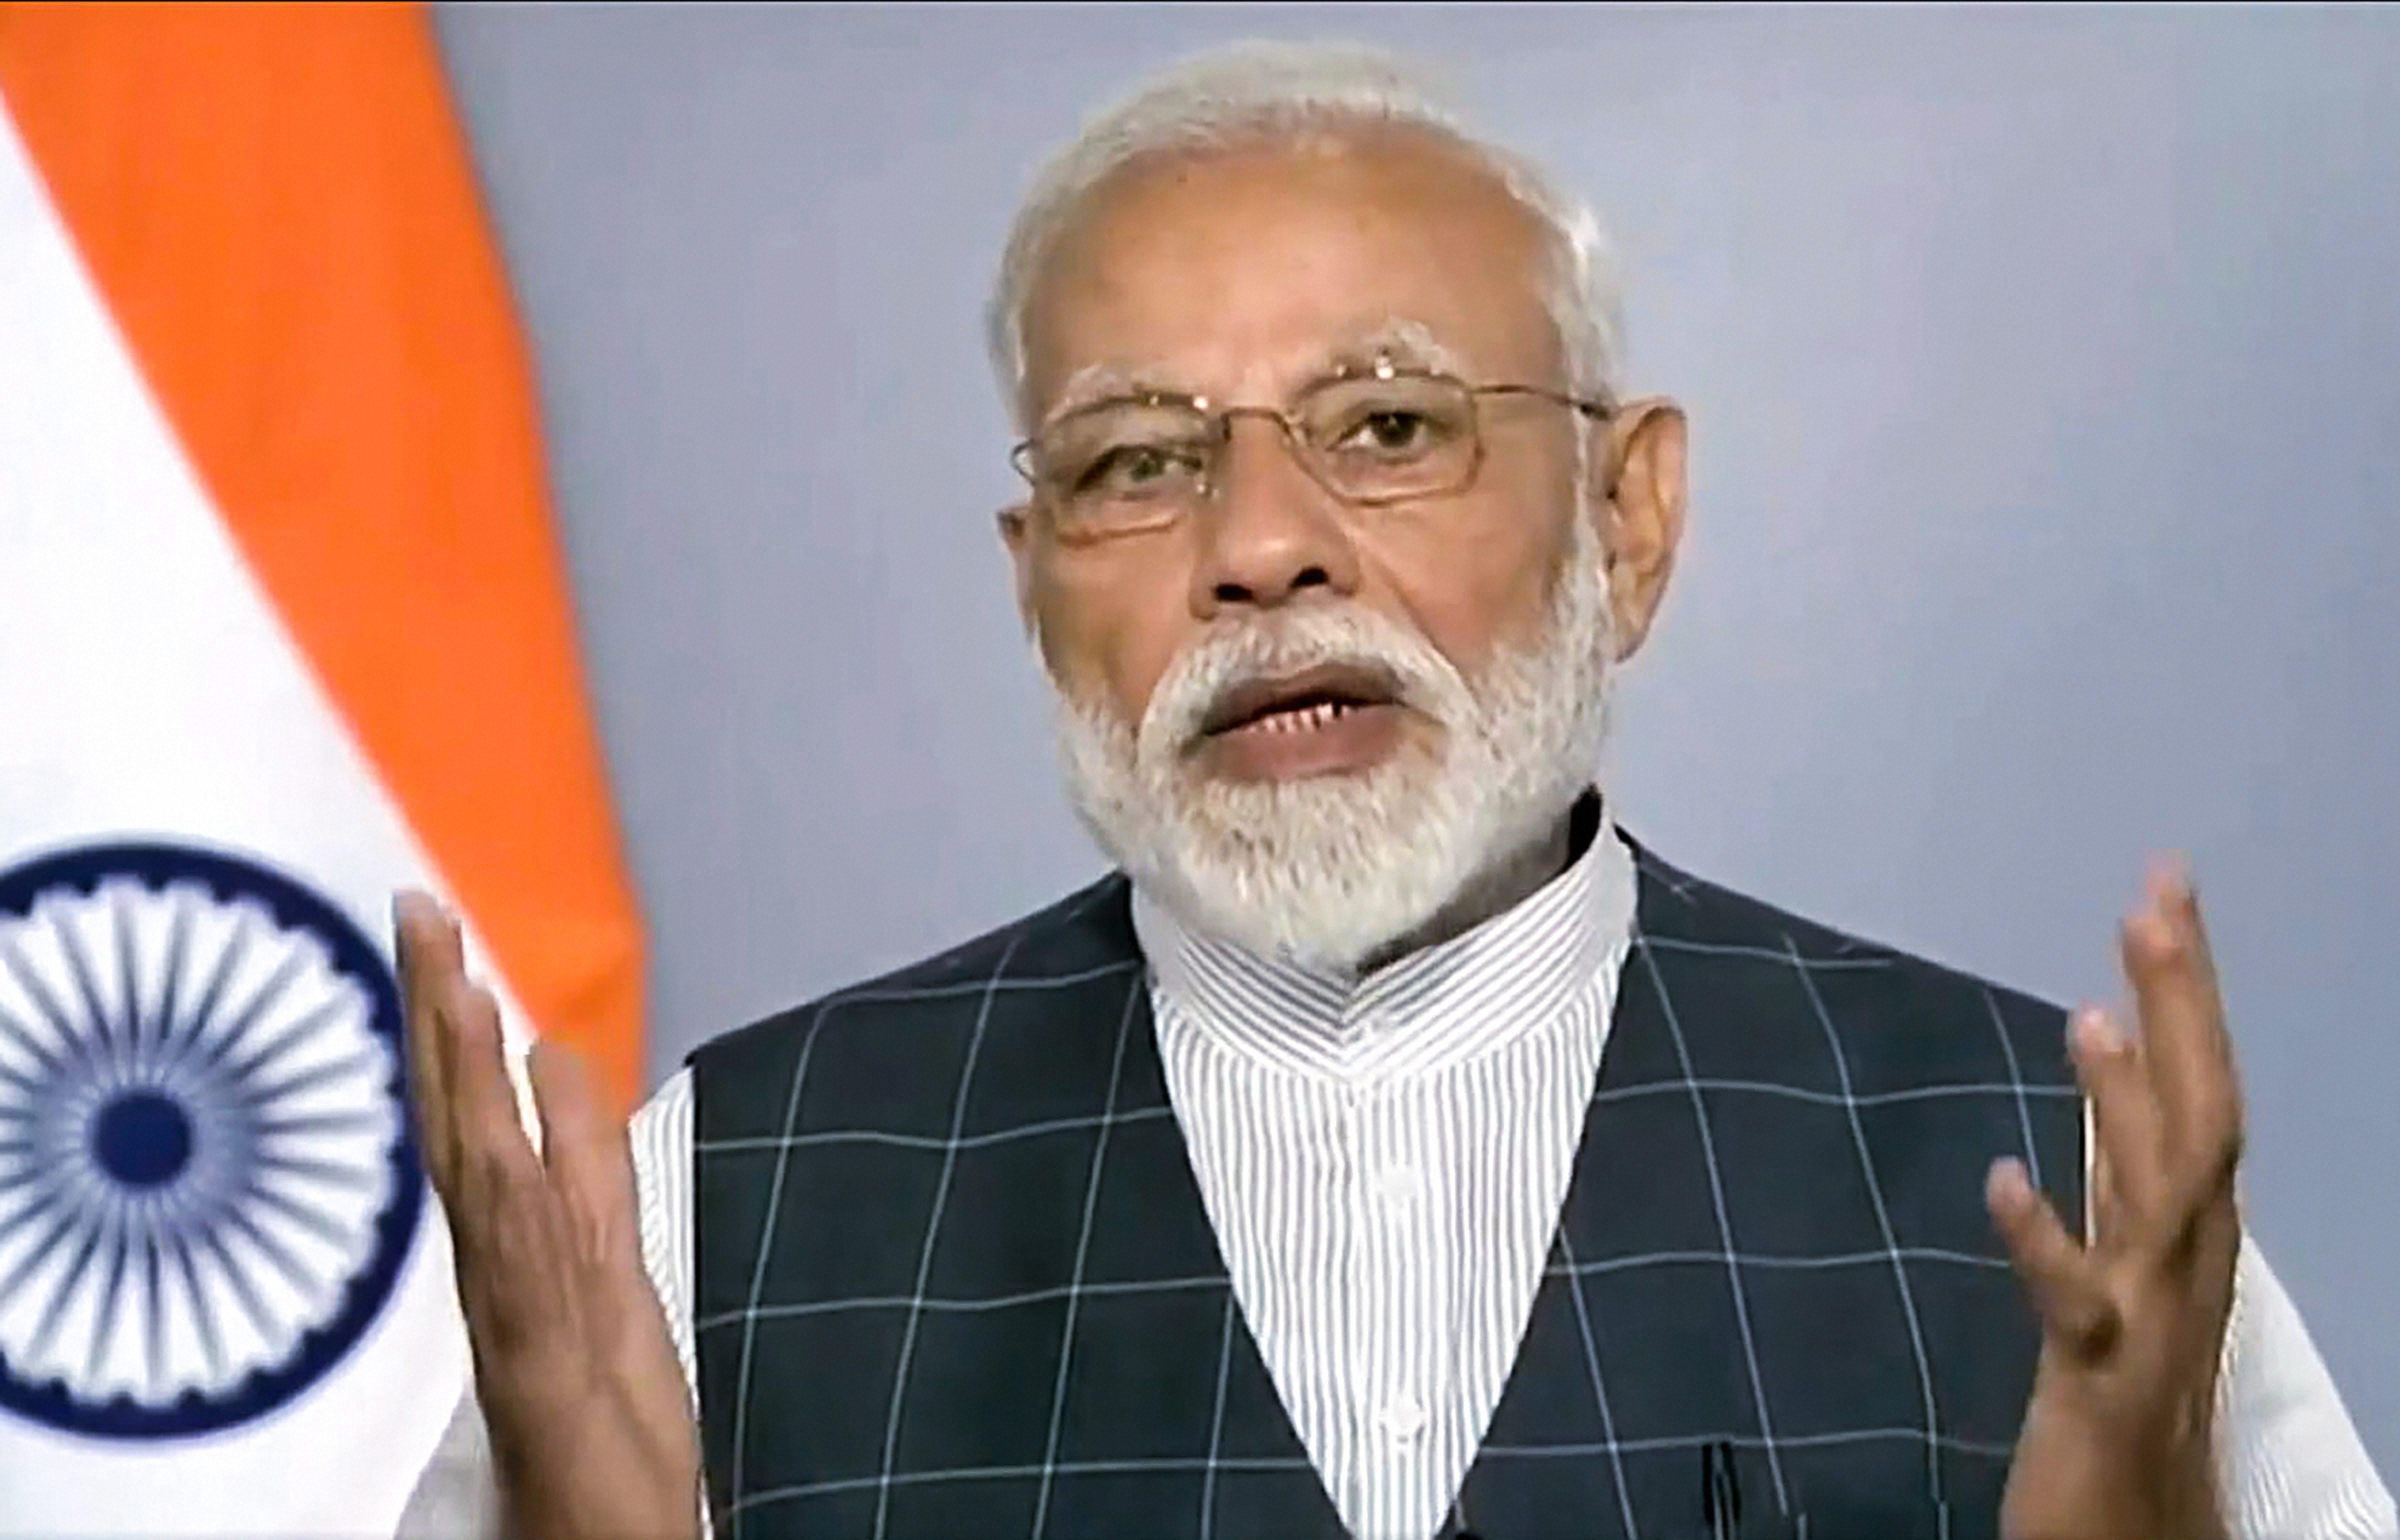 Prime Minister Narendra Modi announces the success of Mission Shakti, India's anti-satellite missile capability programme, in New Delhi on Wednesday.